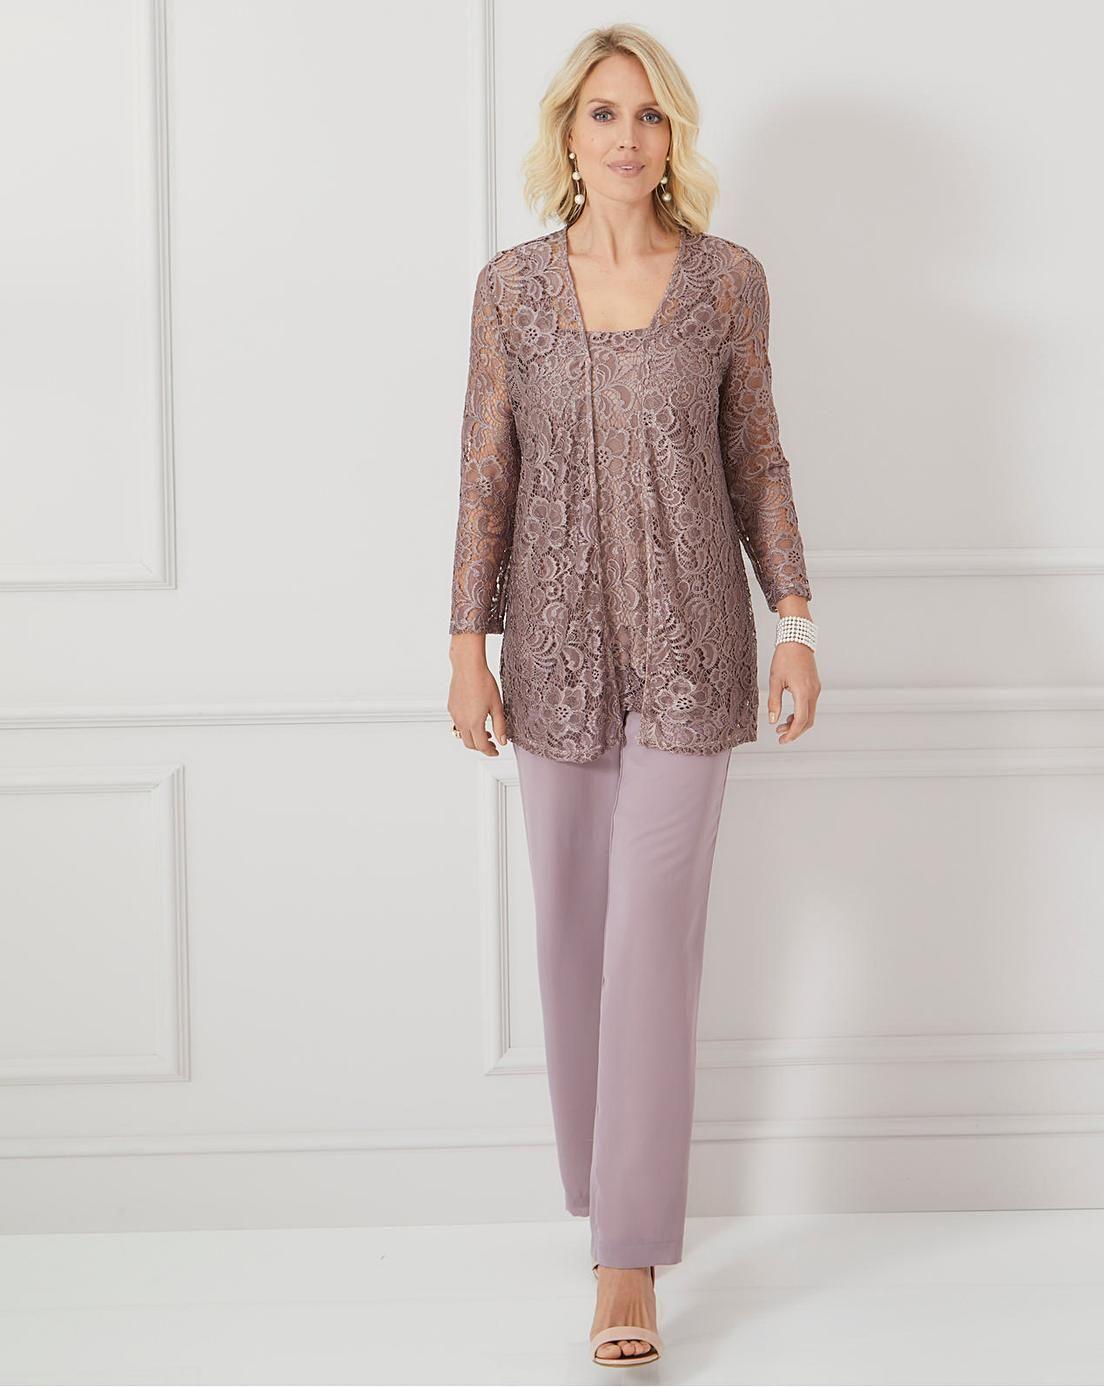 Nightingales Lace 3 Piece Trouser Set Chiffon Fashion Mother Of The Bride Pants Outfit Chiffon Pants [ 1387 x 1104 Pixel ]